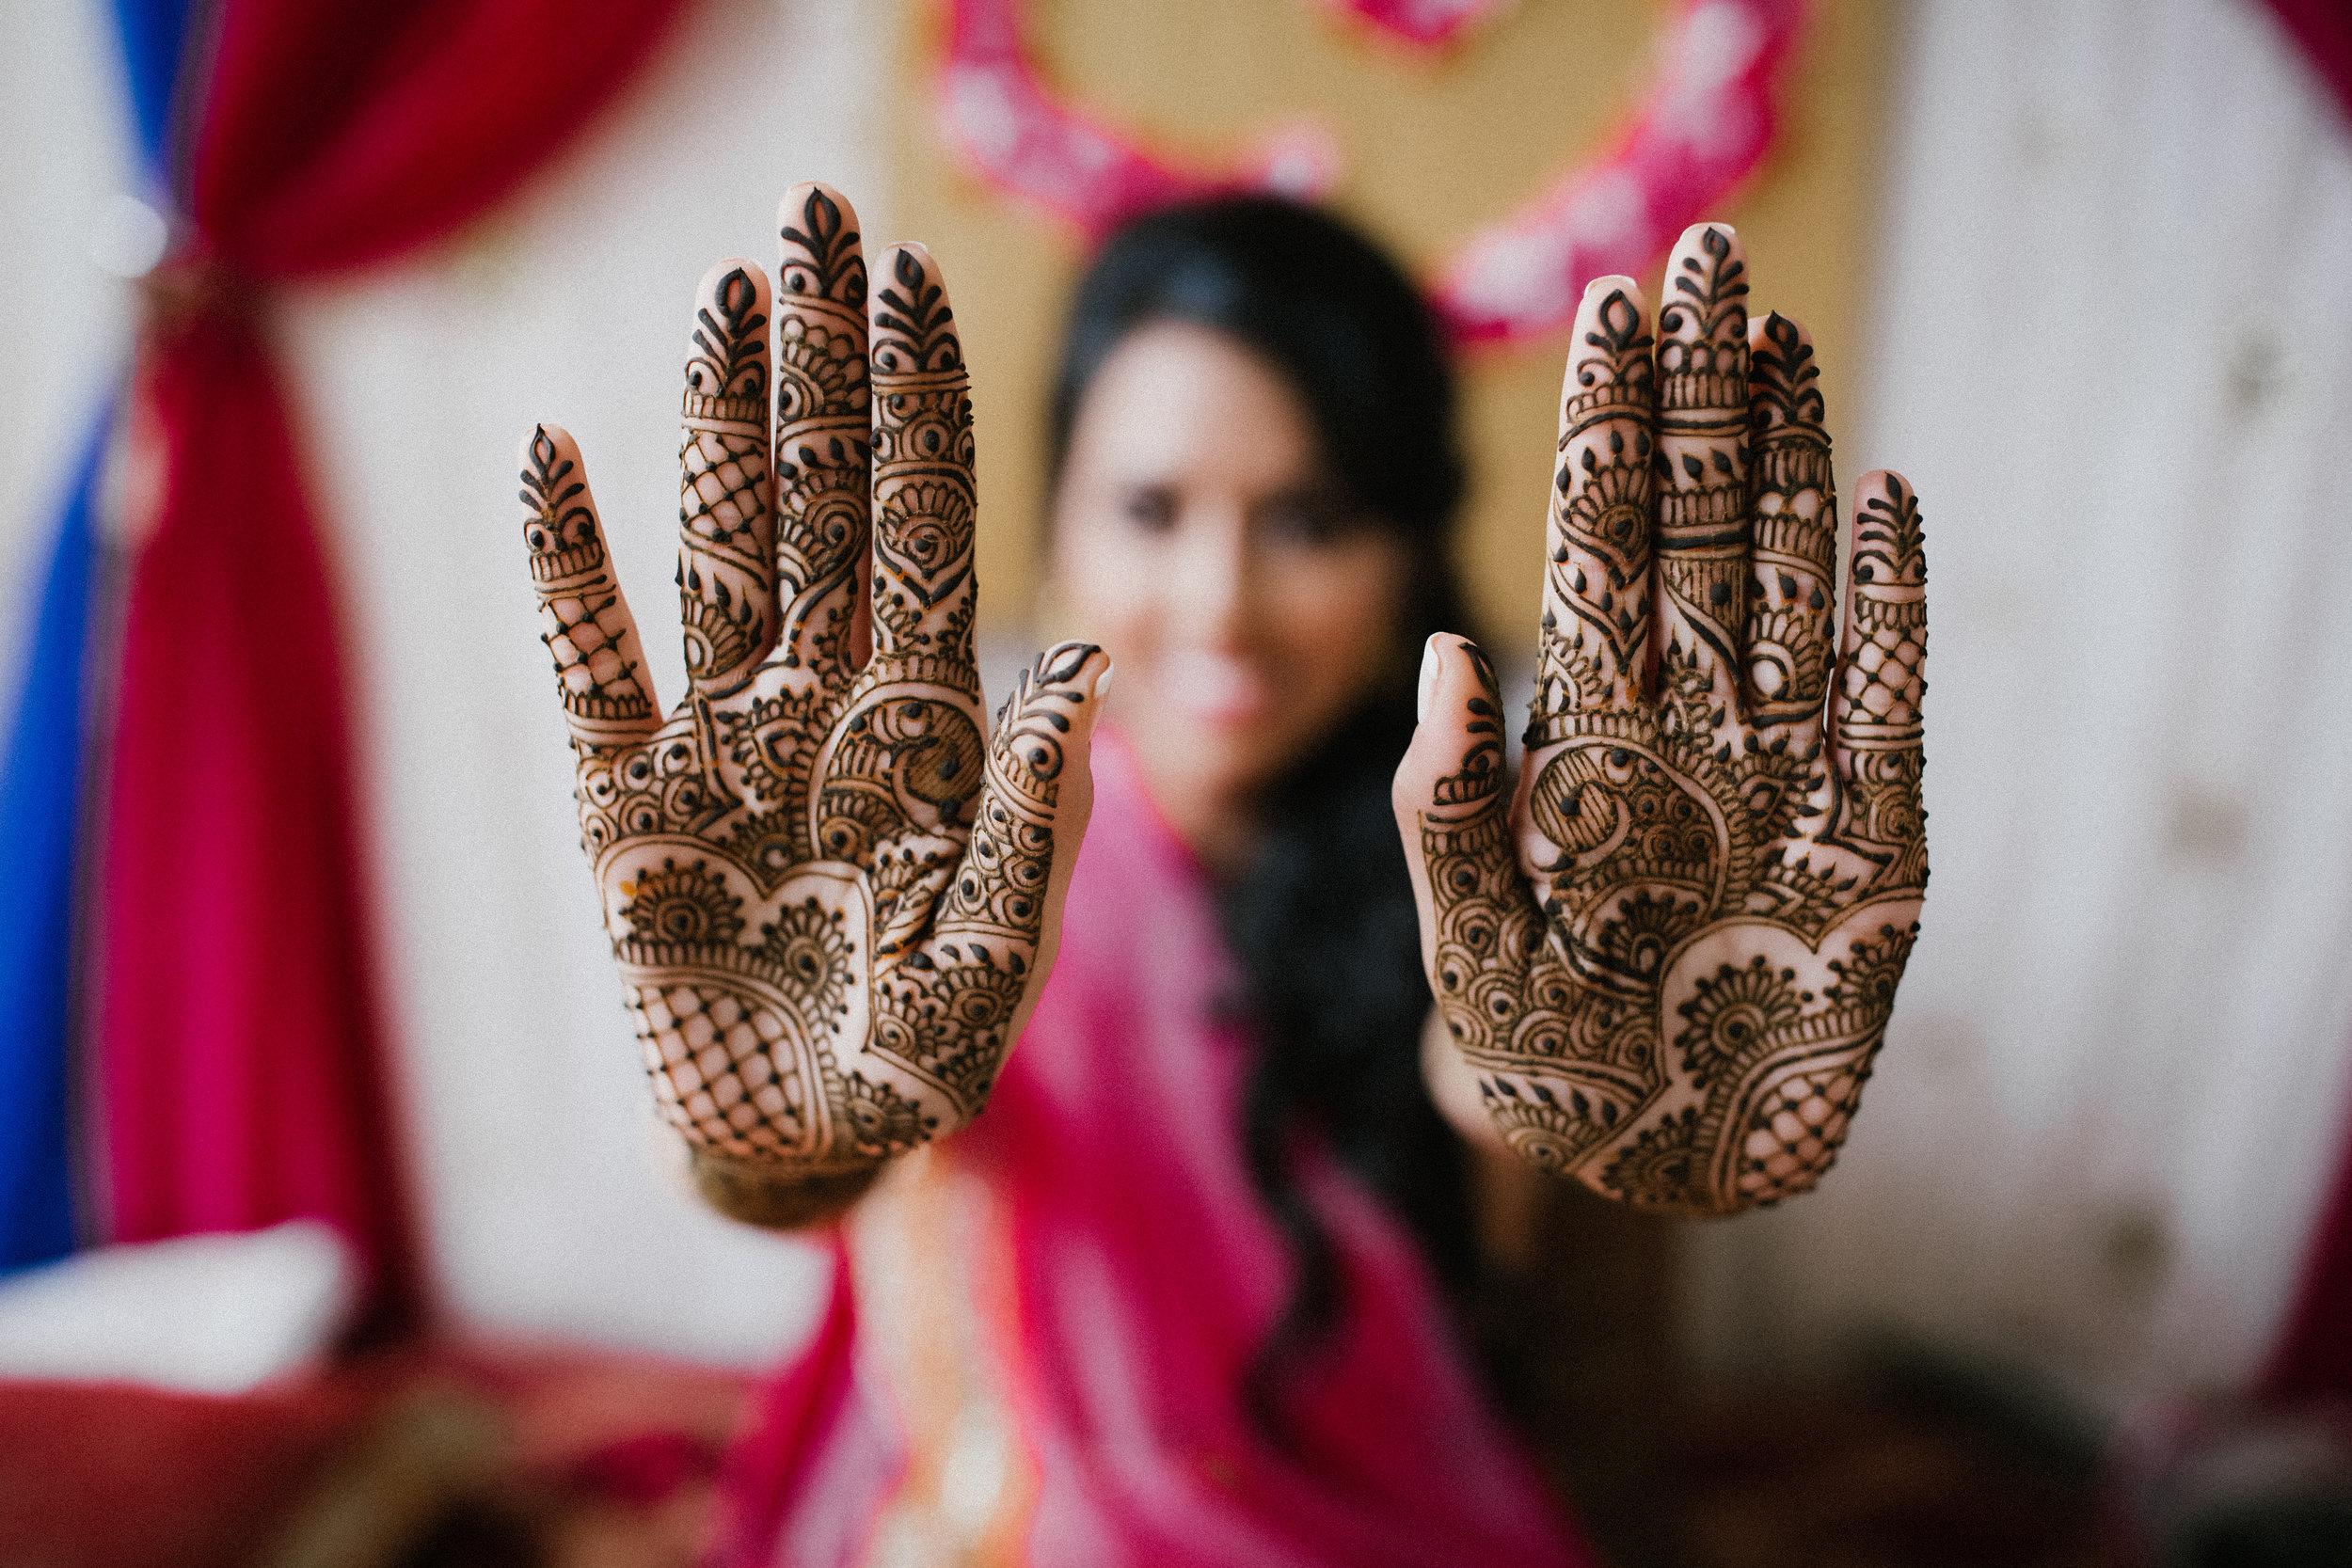 Aparna-Ankit-Patel-Mehndi-Wedding-Photos-0031.jpg